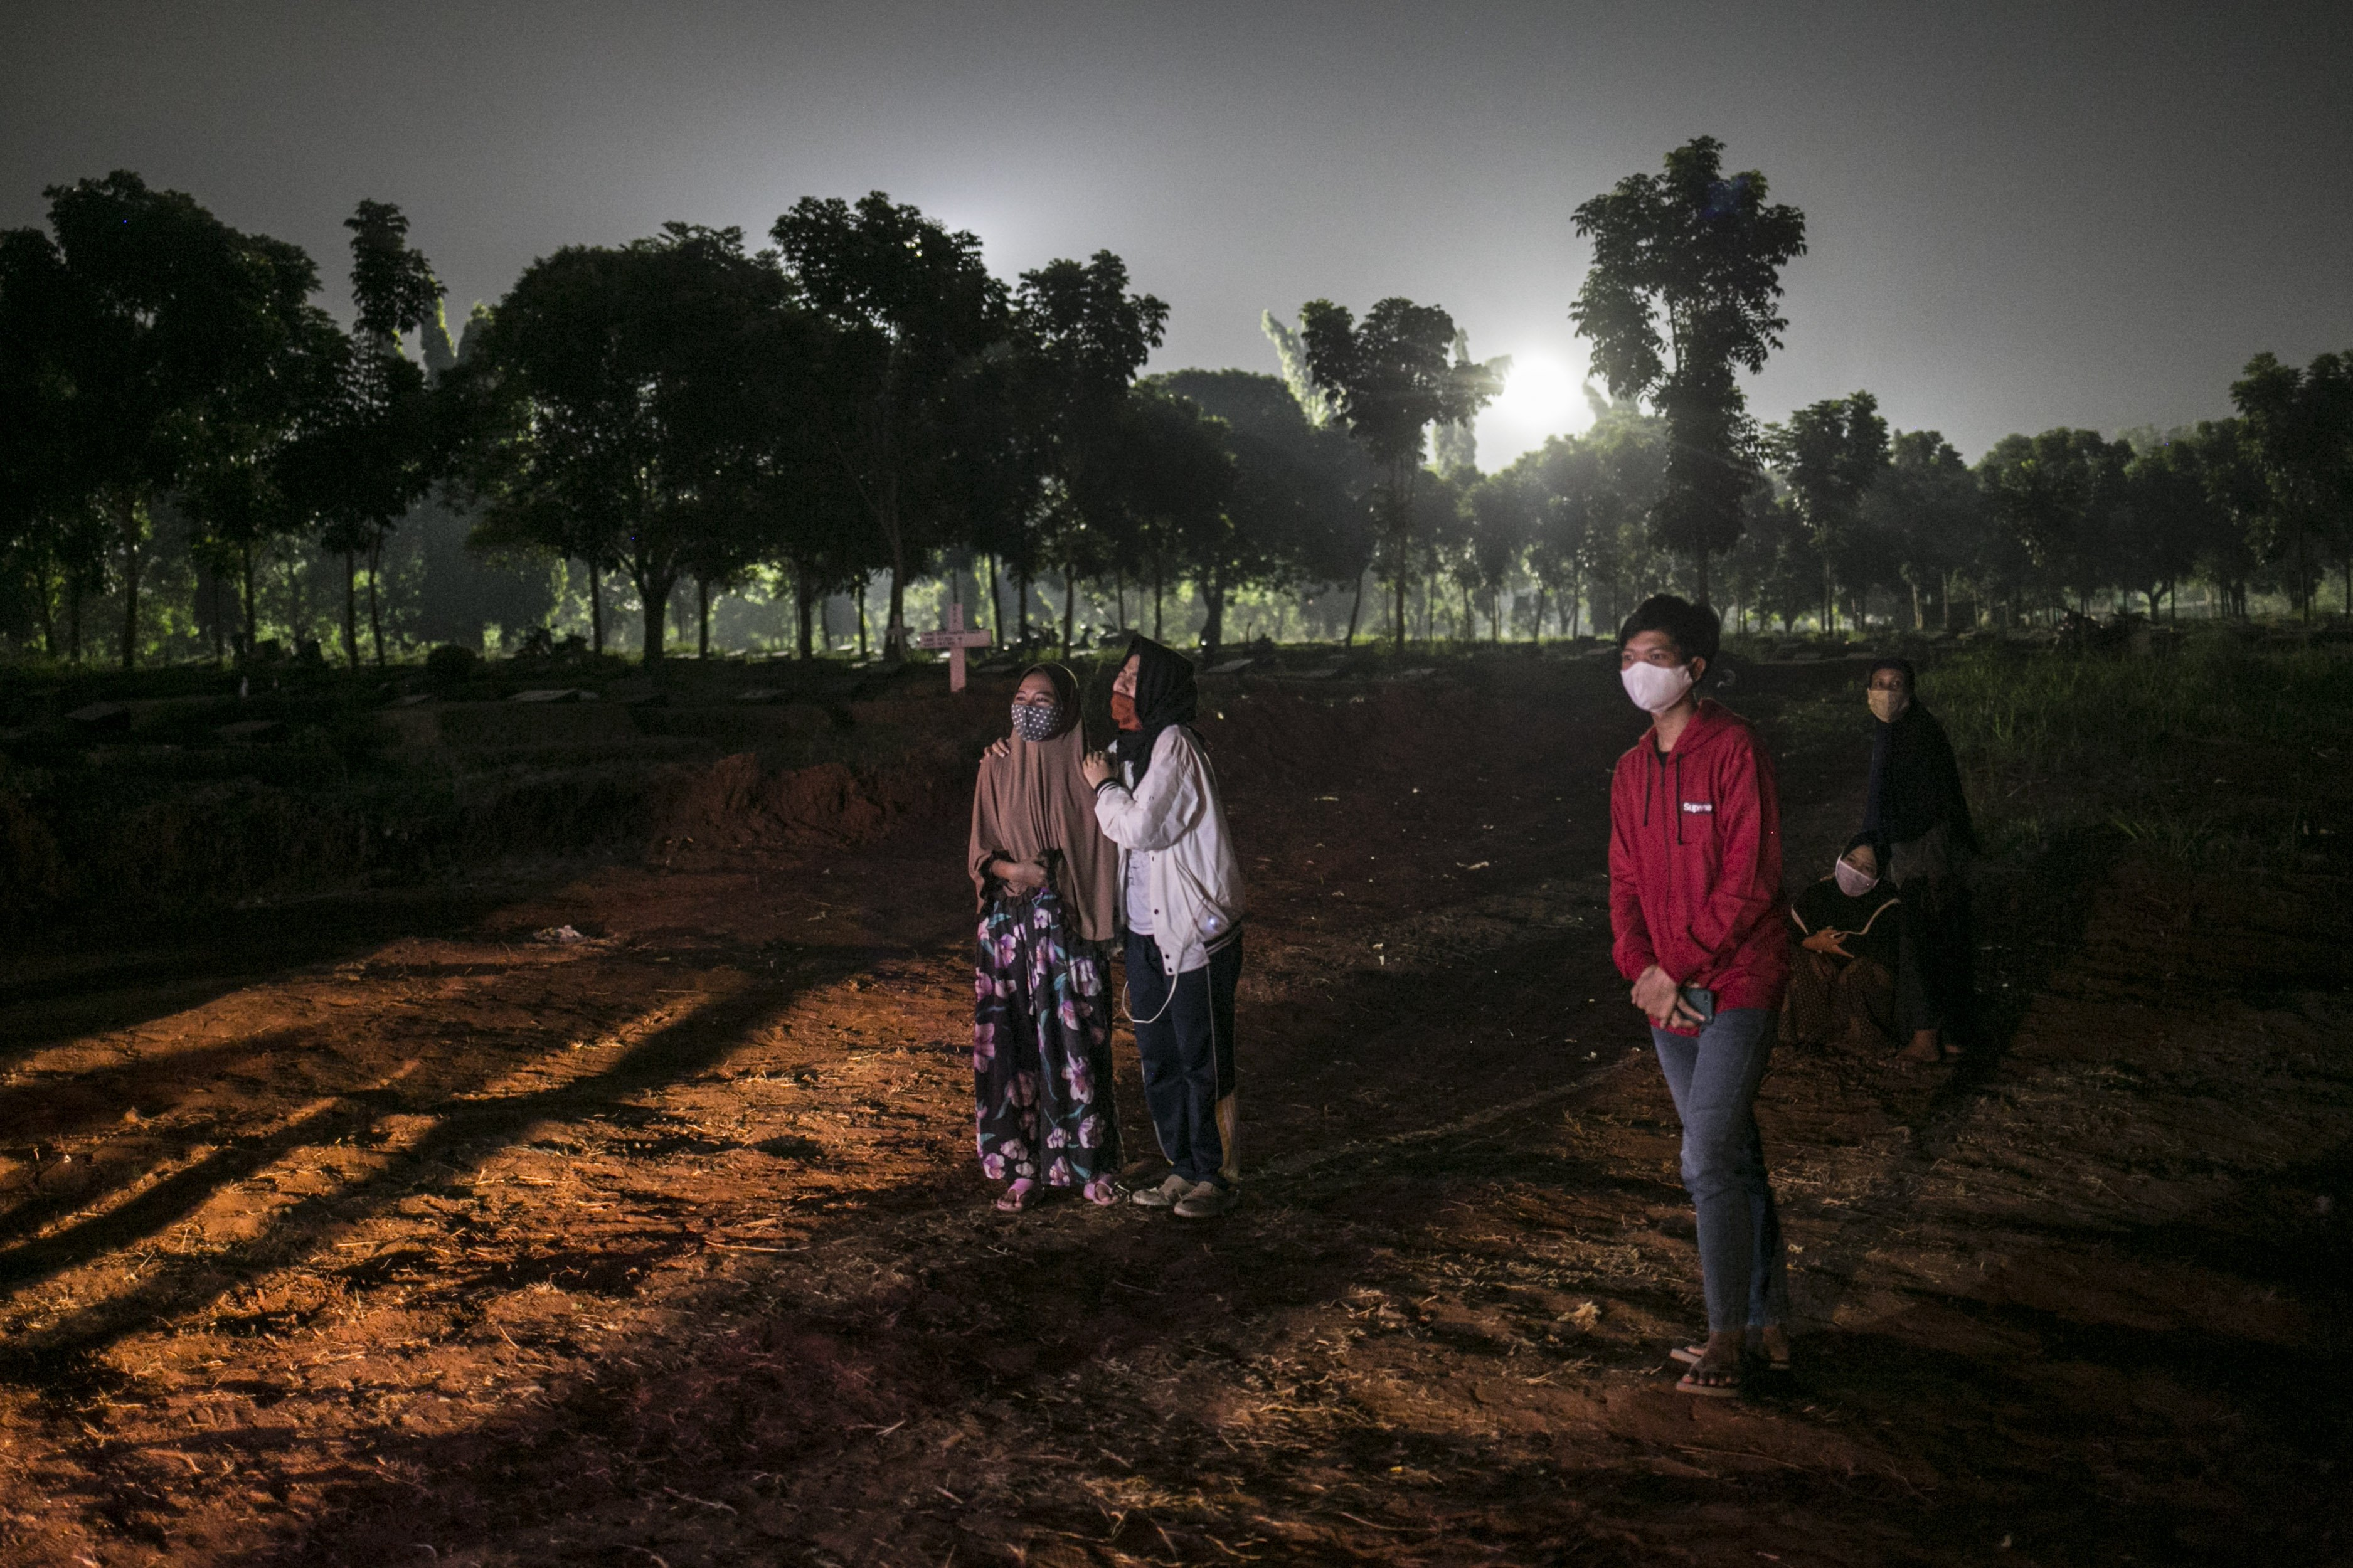 Keluarga korban covid-19 menyaksikan pemakaman keluarganya dengan jarak yang jauh di TPU Pondok Rangon, Jakarta, Kamis (16/7/2020).